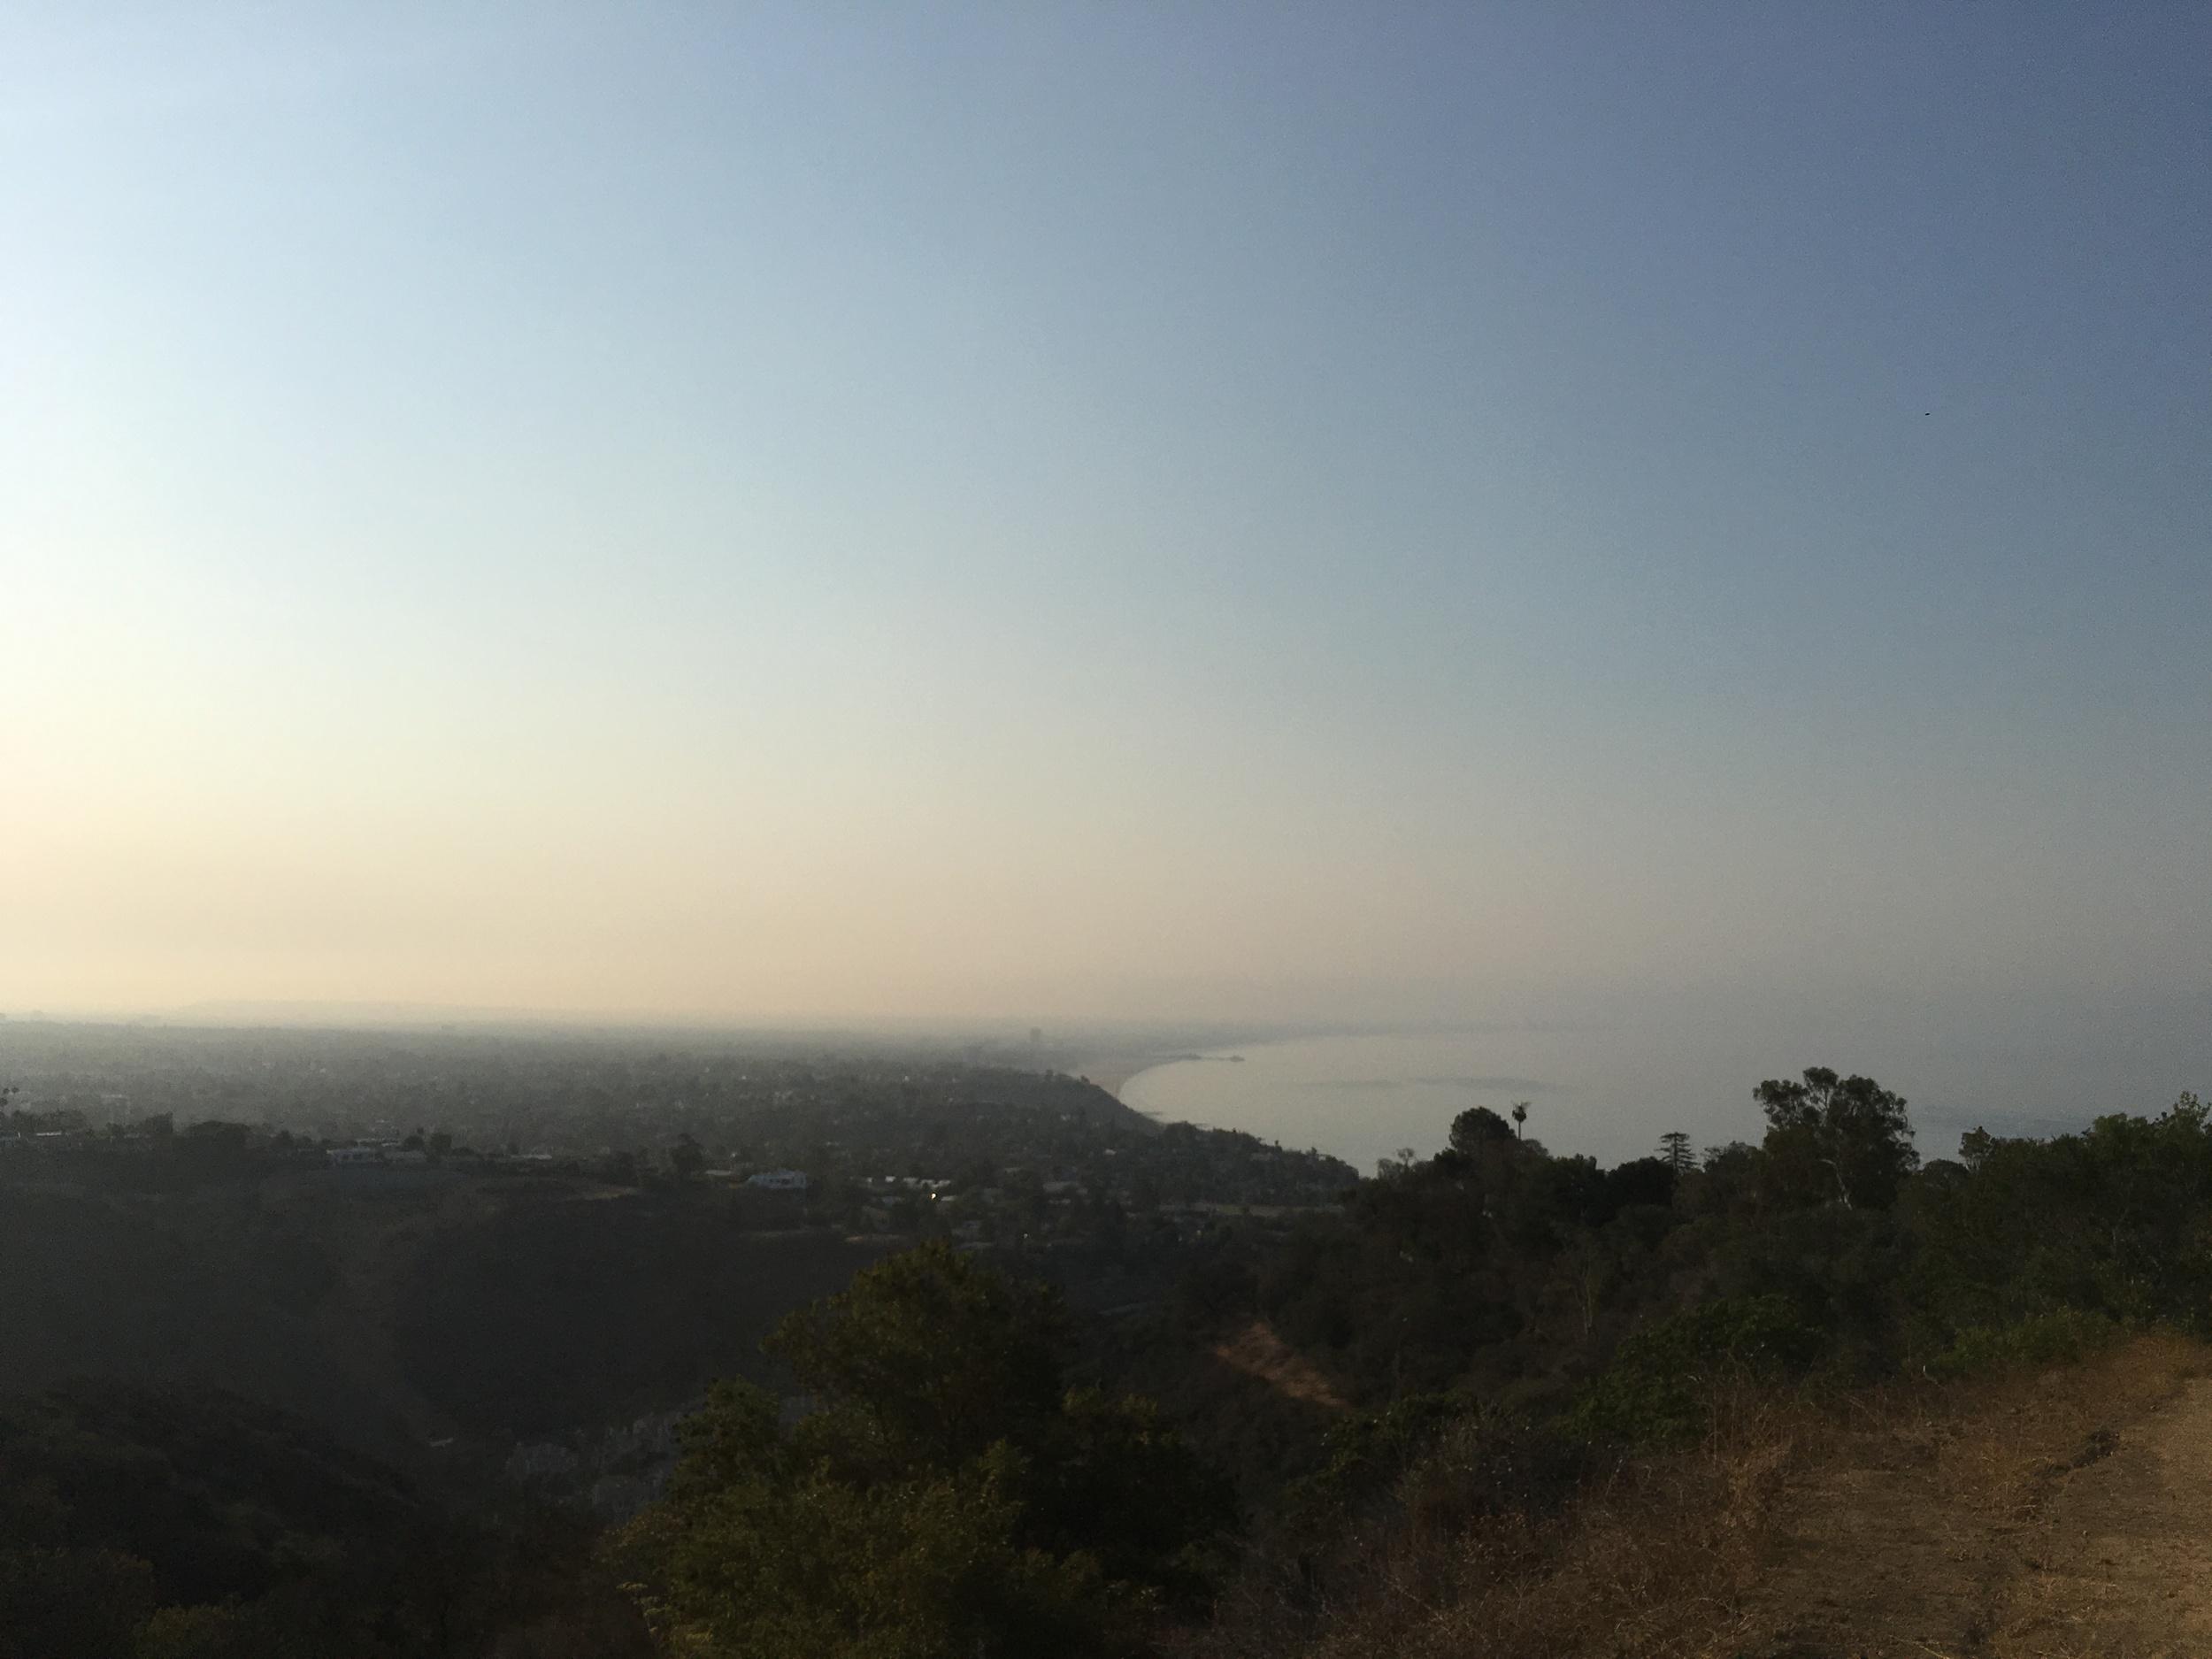 Beautiful view looking back towards Santa Monica